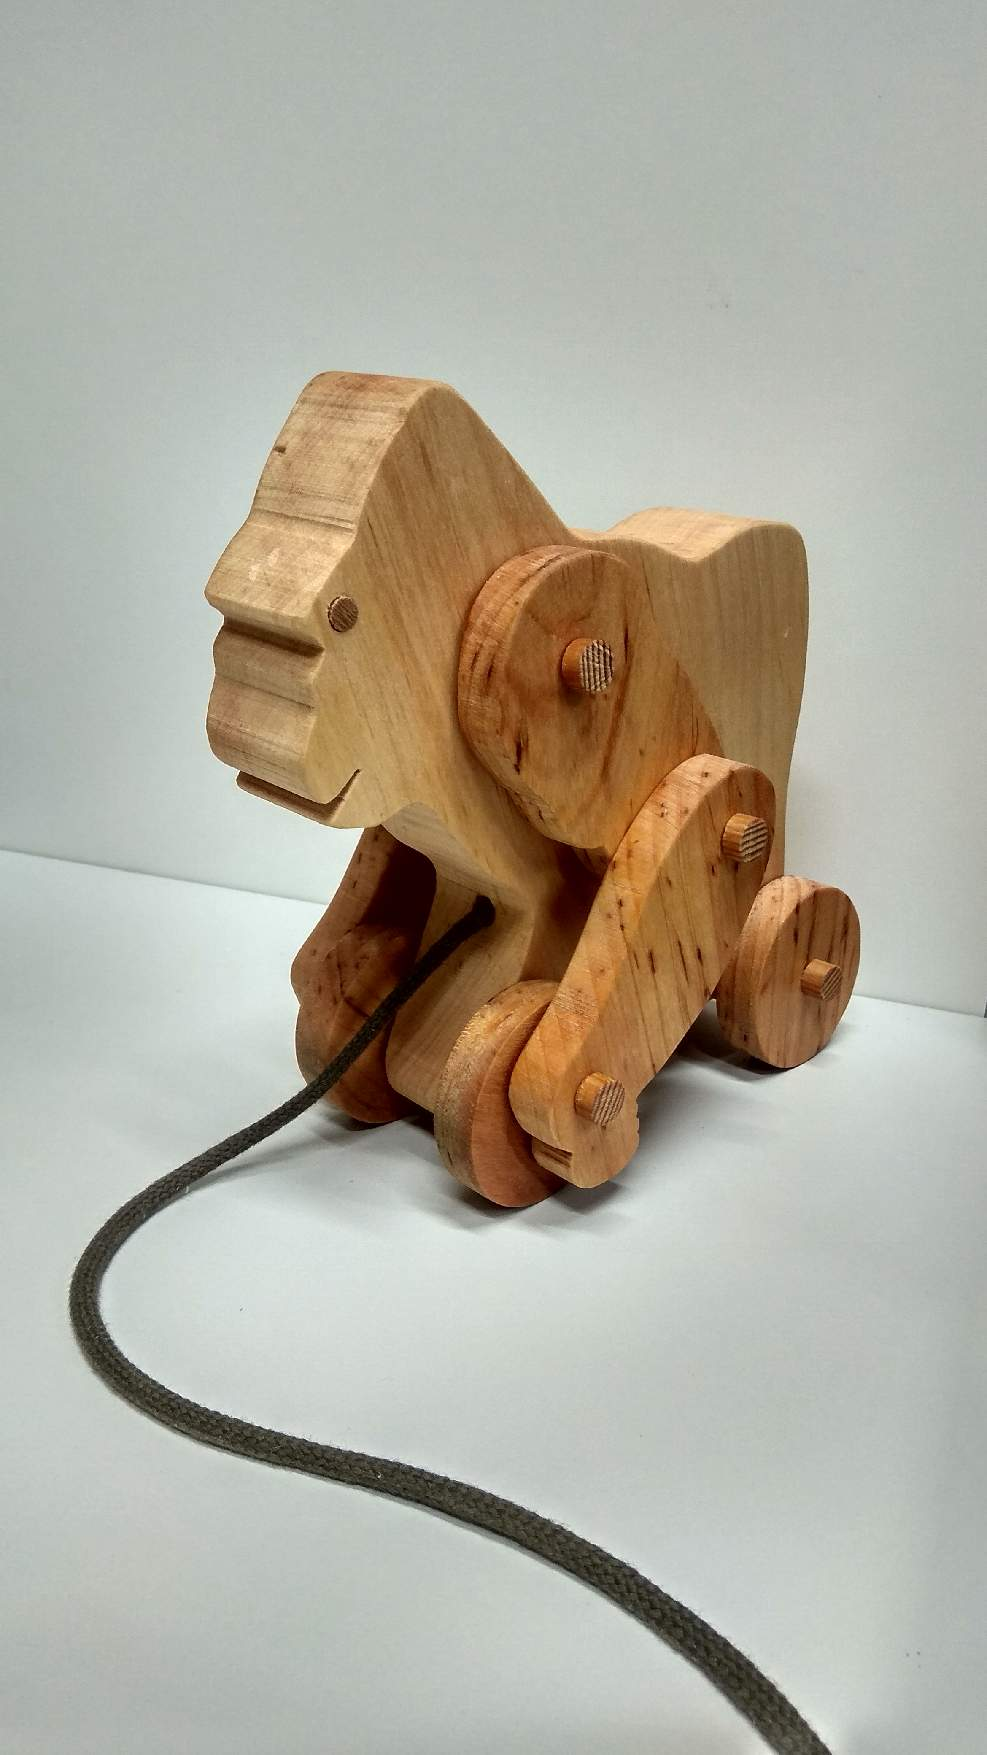 Goryl na kółkach - ruchoma zabawka z drewna, 2020